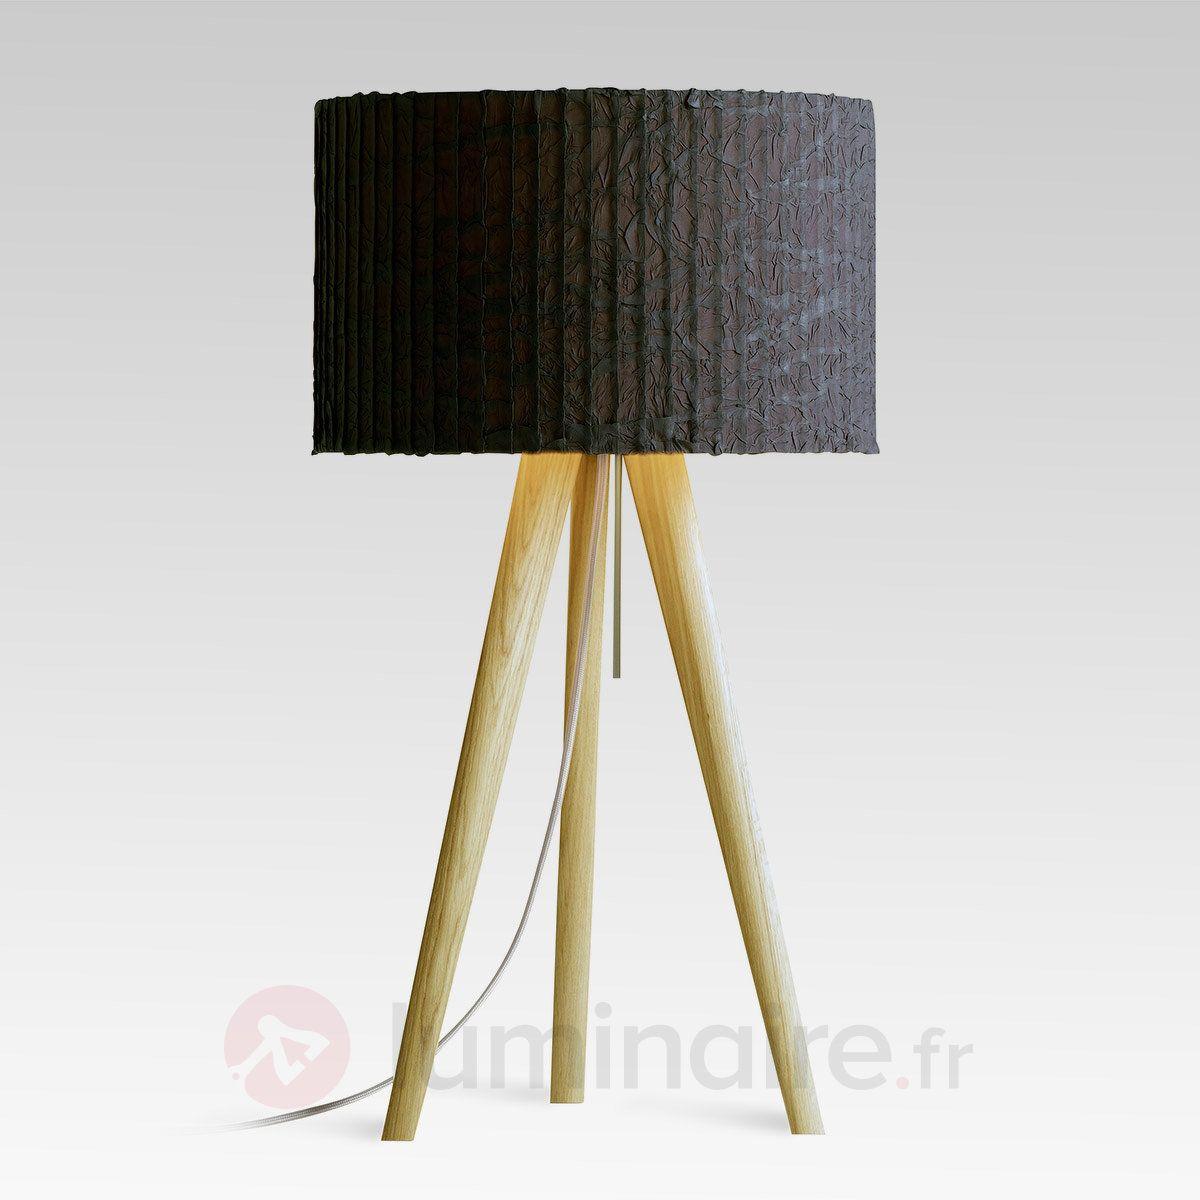 lampe poser sten cloud chne blanc graphite cloudluminairelights - Luminaire Style Scandinave